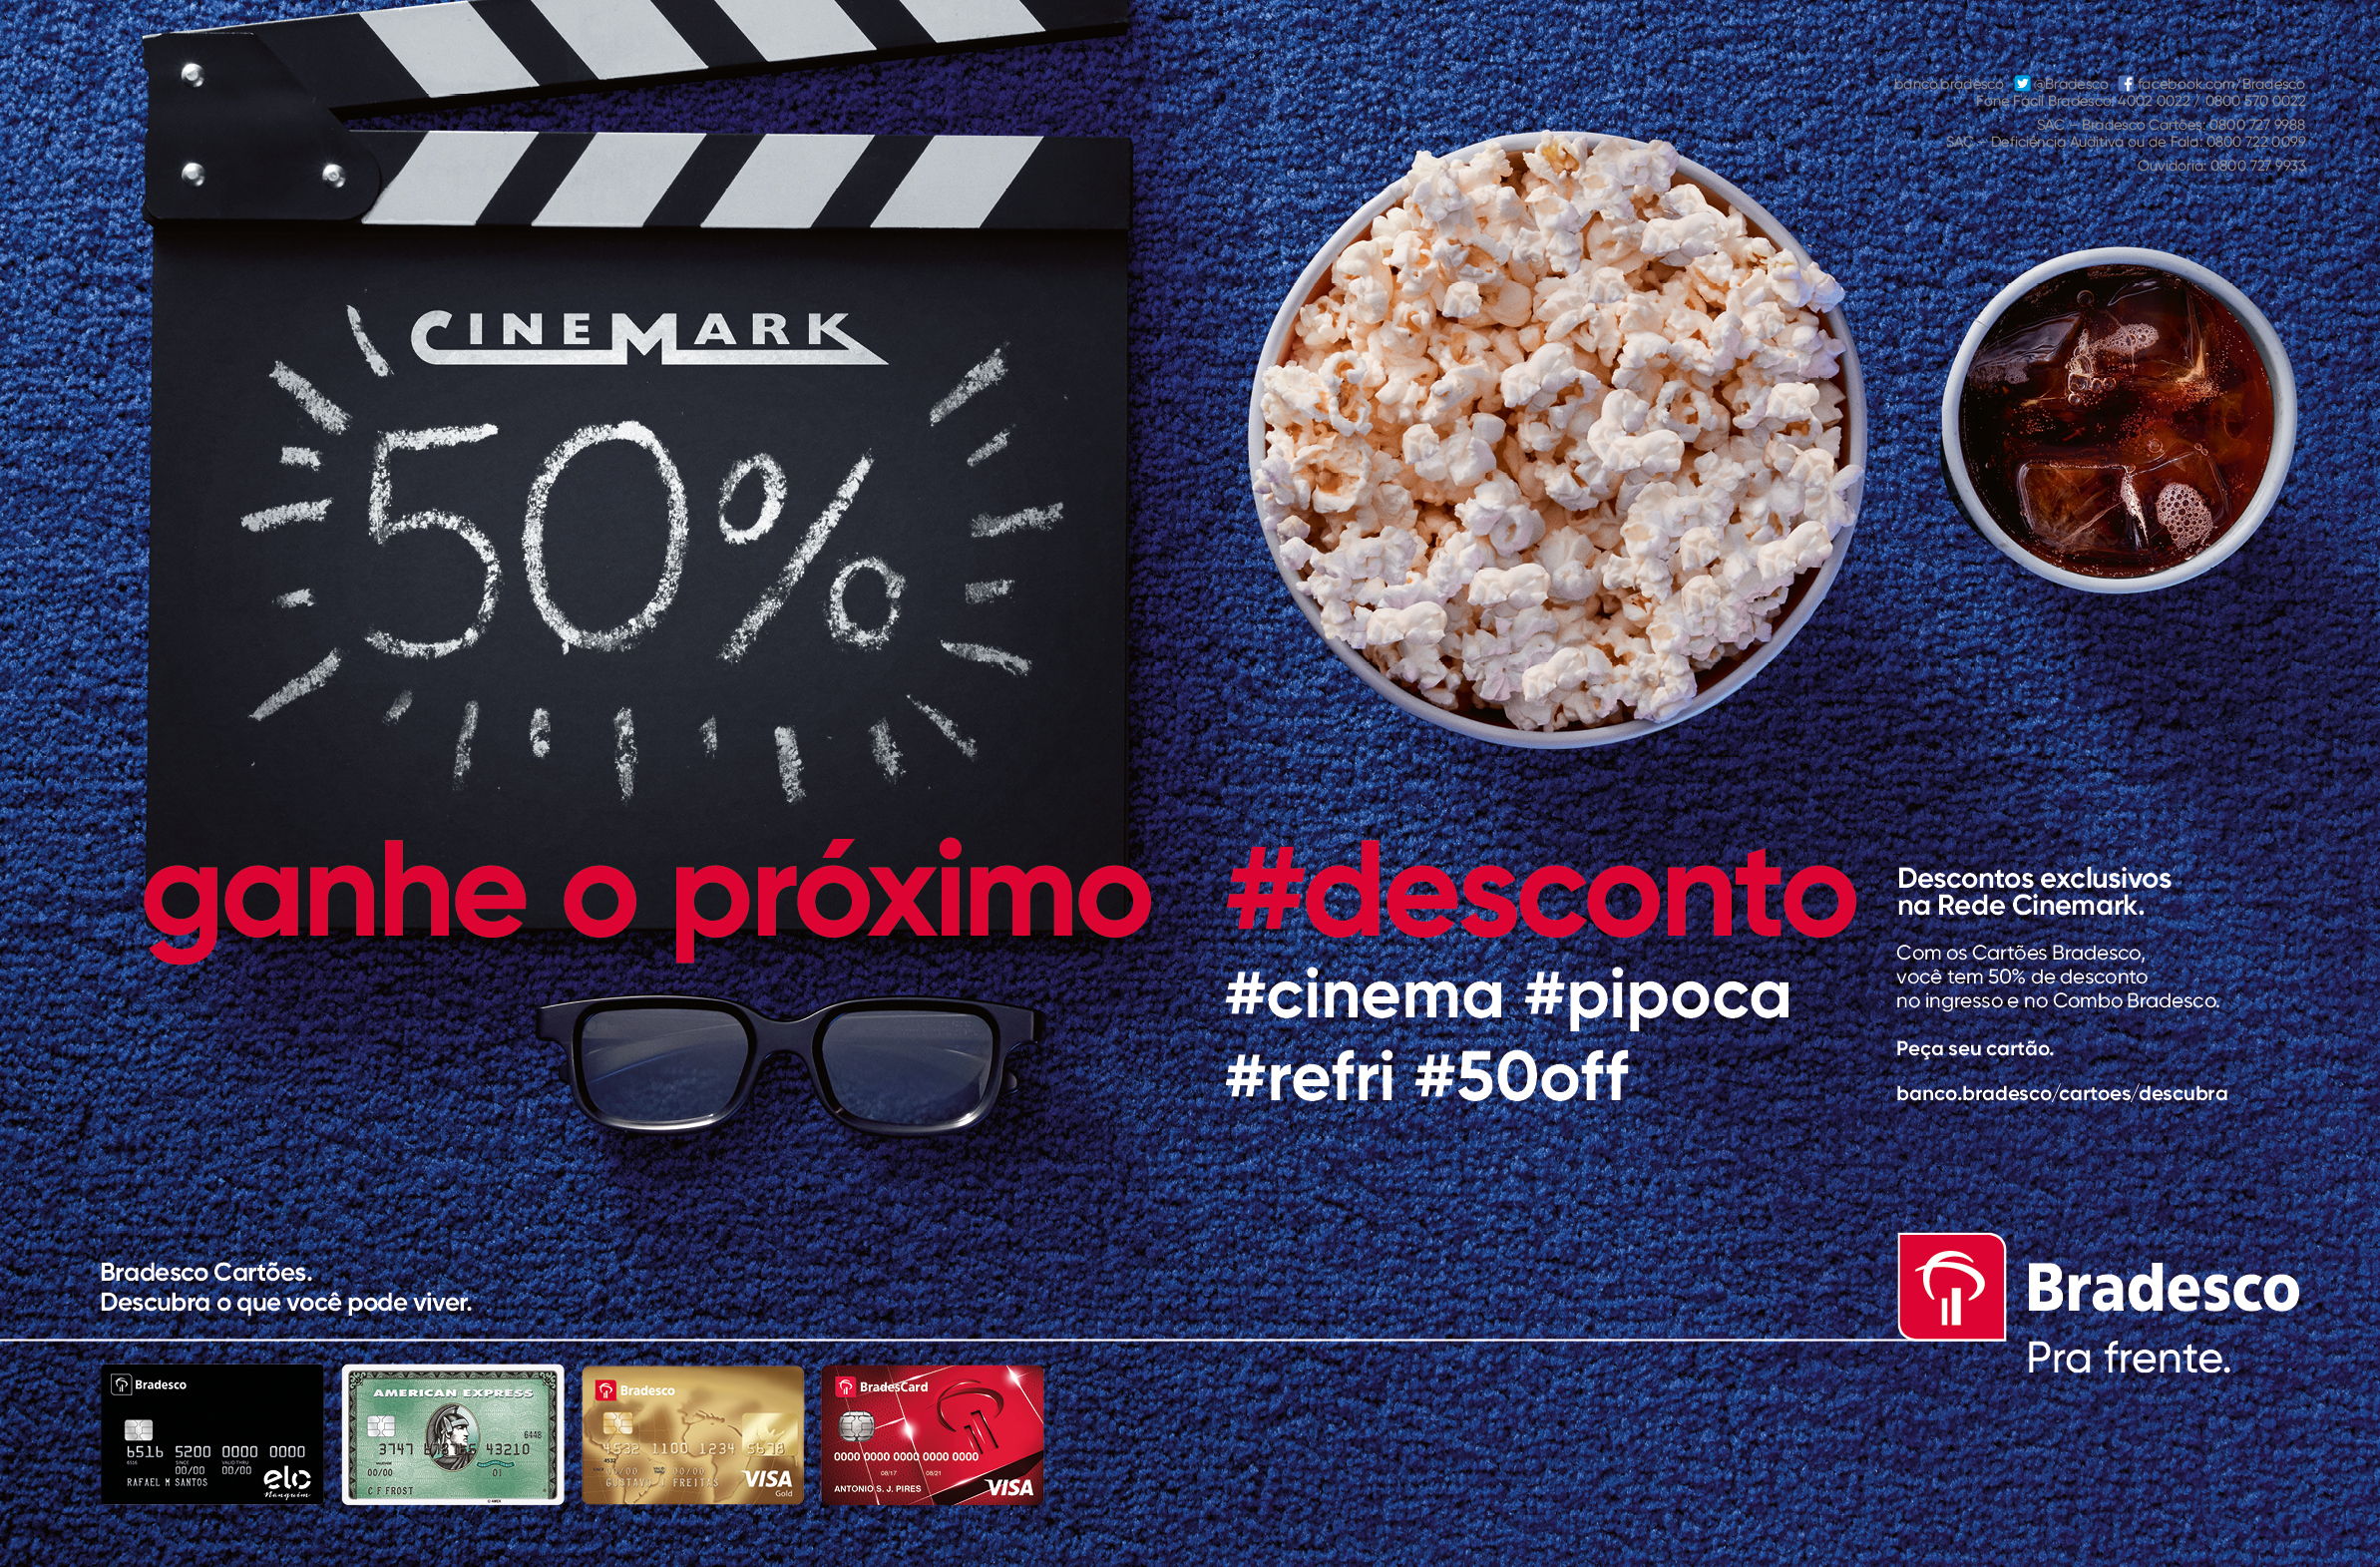 Copy:  Get the next discount.. #cinema #popcorn #soda #50%off